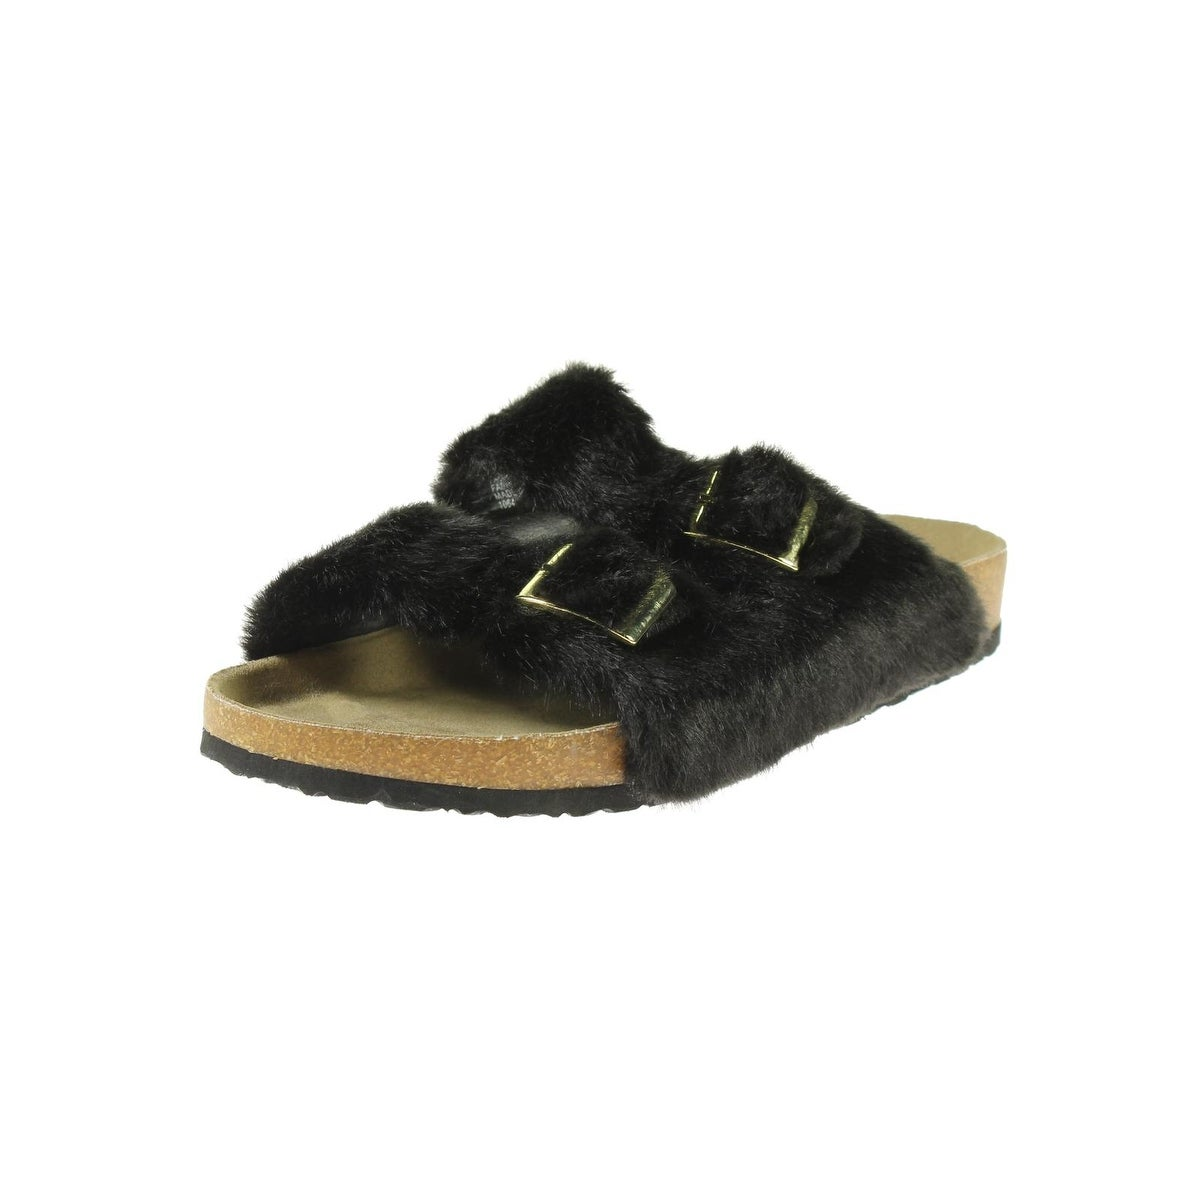 cd7b5da4735 Shop Steve Madden Womens Soul Slide Sandals Faux Fur Double Strap ...